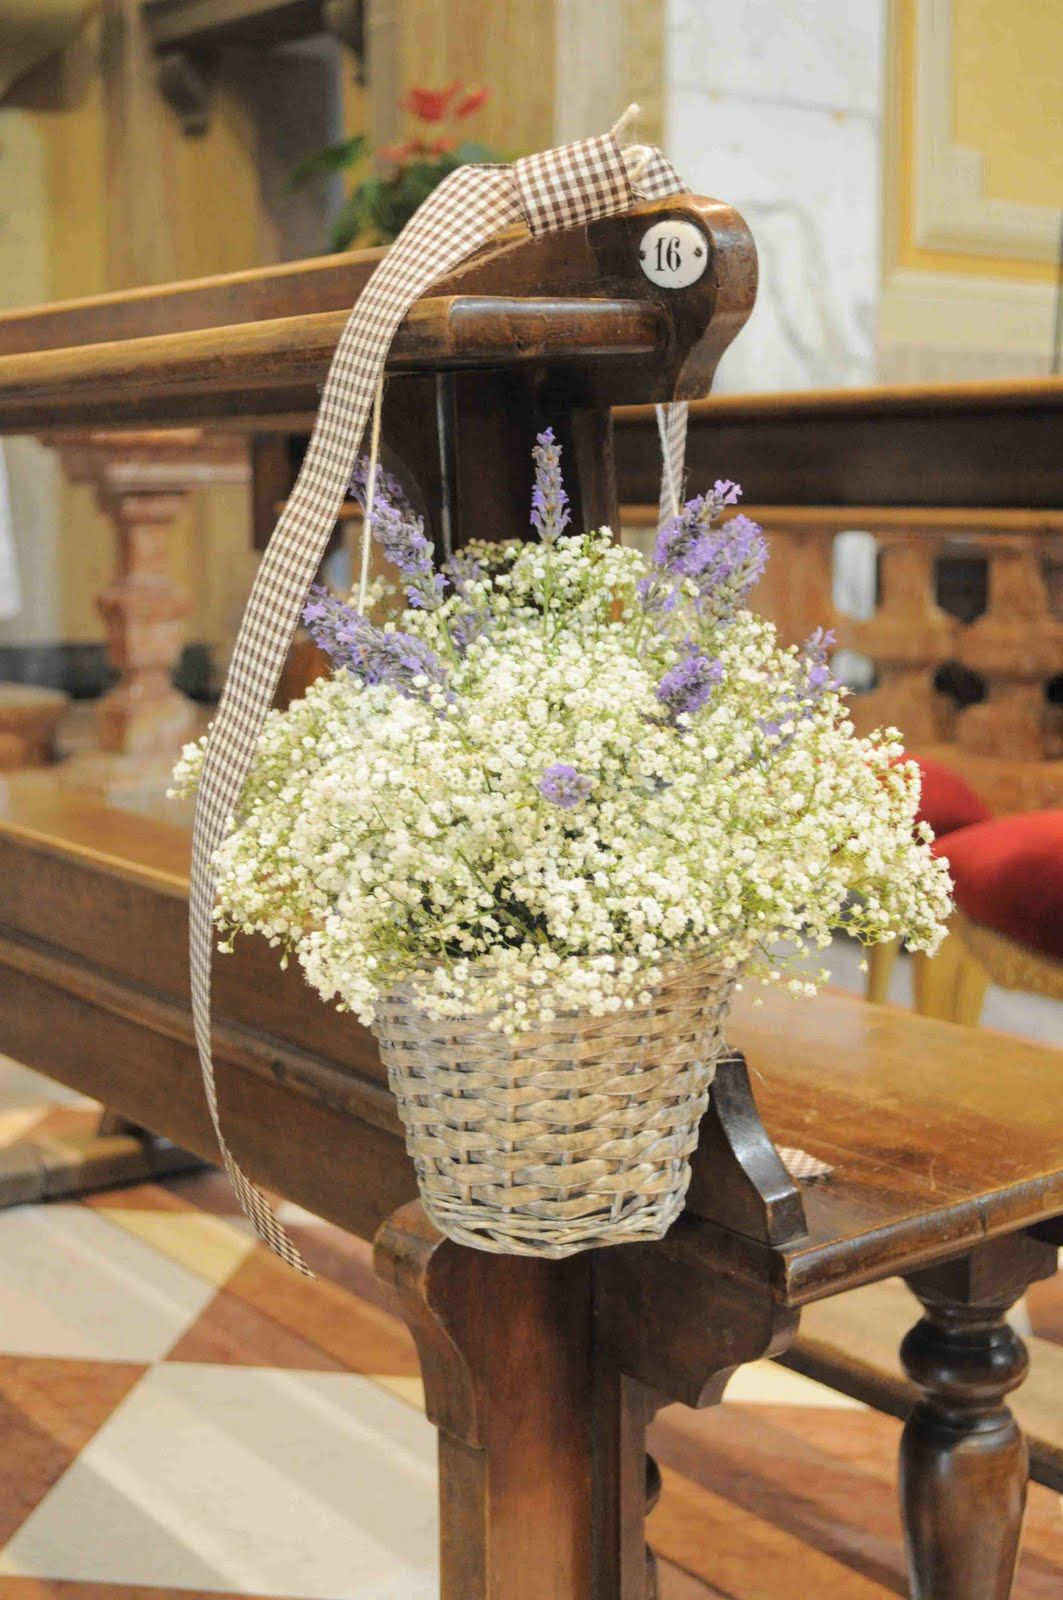 Allestimenti Floreali Matrimonio Country Chic : Allestimenti matrimonio con piante aromatiche cerca